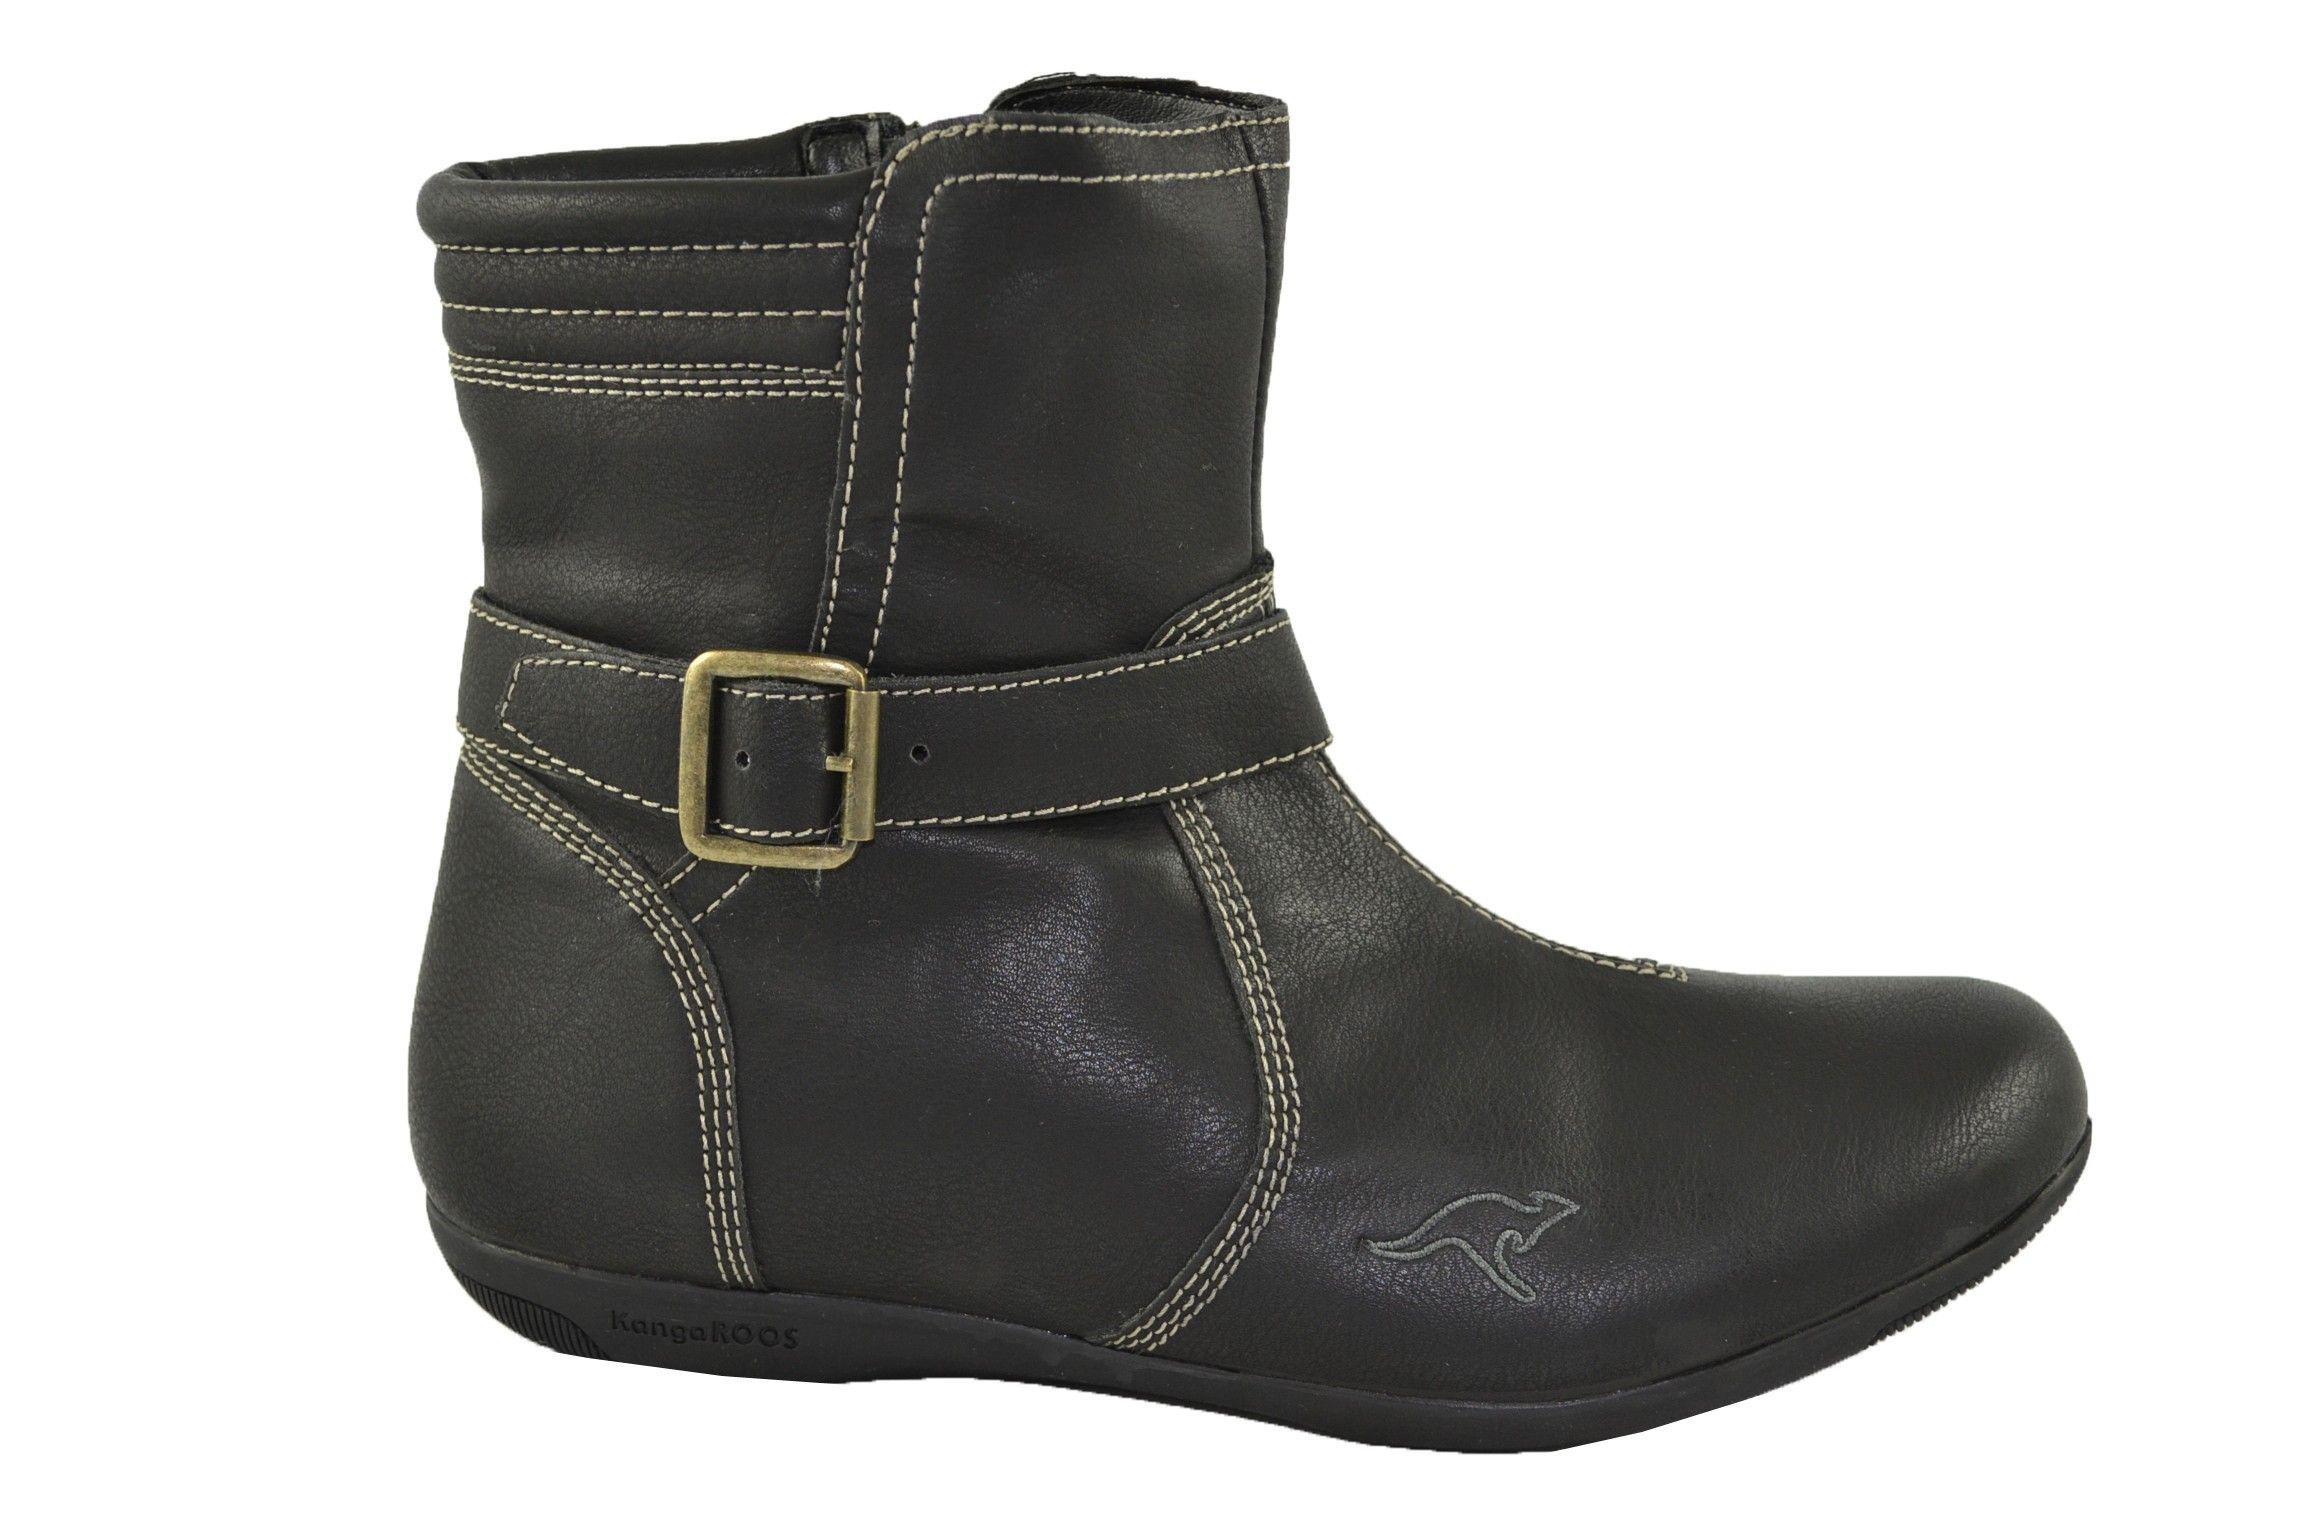 Doctor Doctor Cuna Flex Flex Flex Zapatos Cuna Marron Marron Zapatos Doctor wpHttqgS